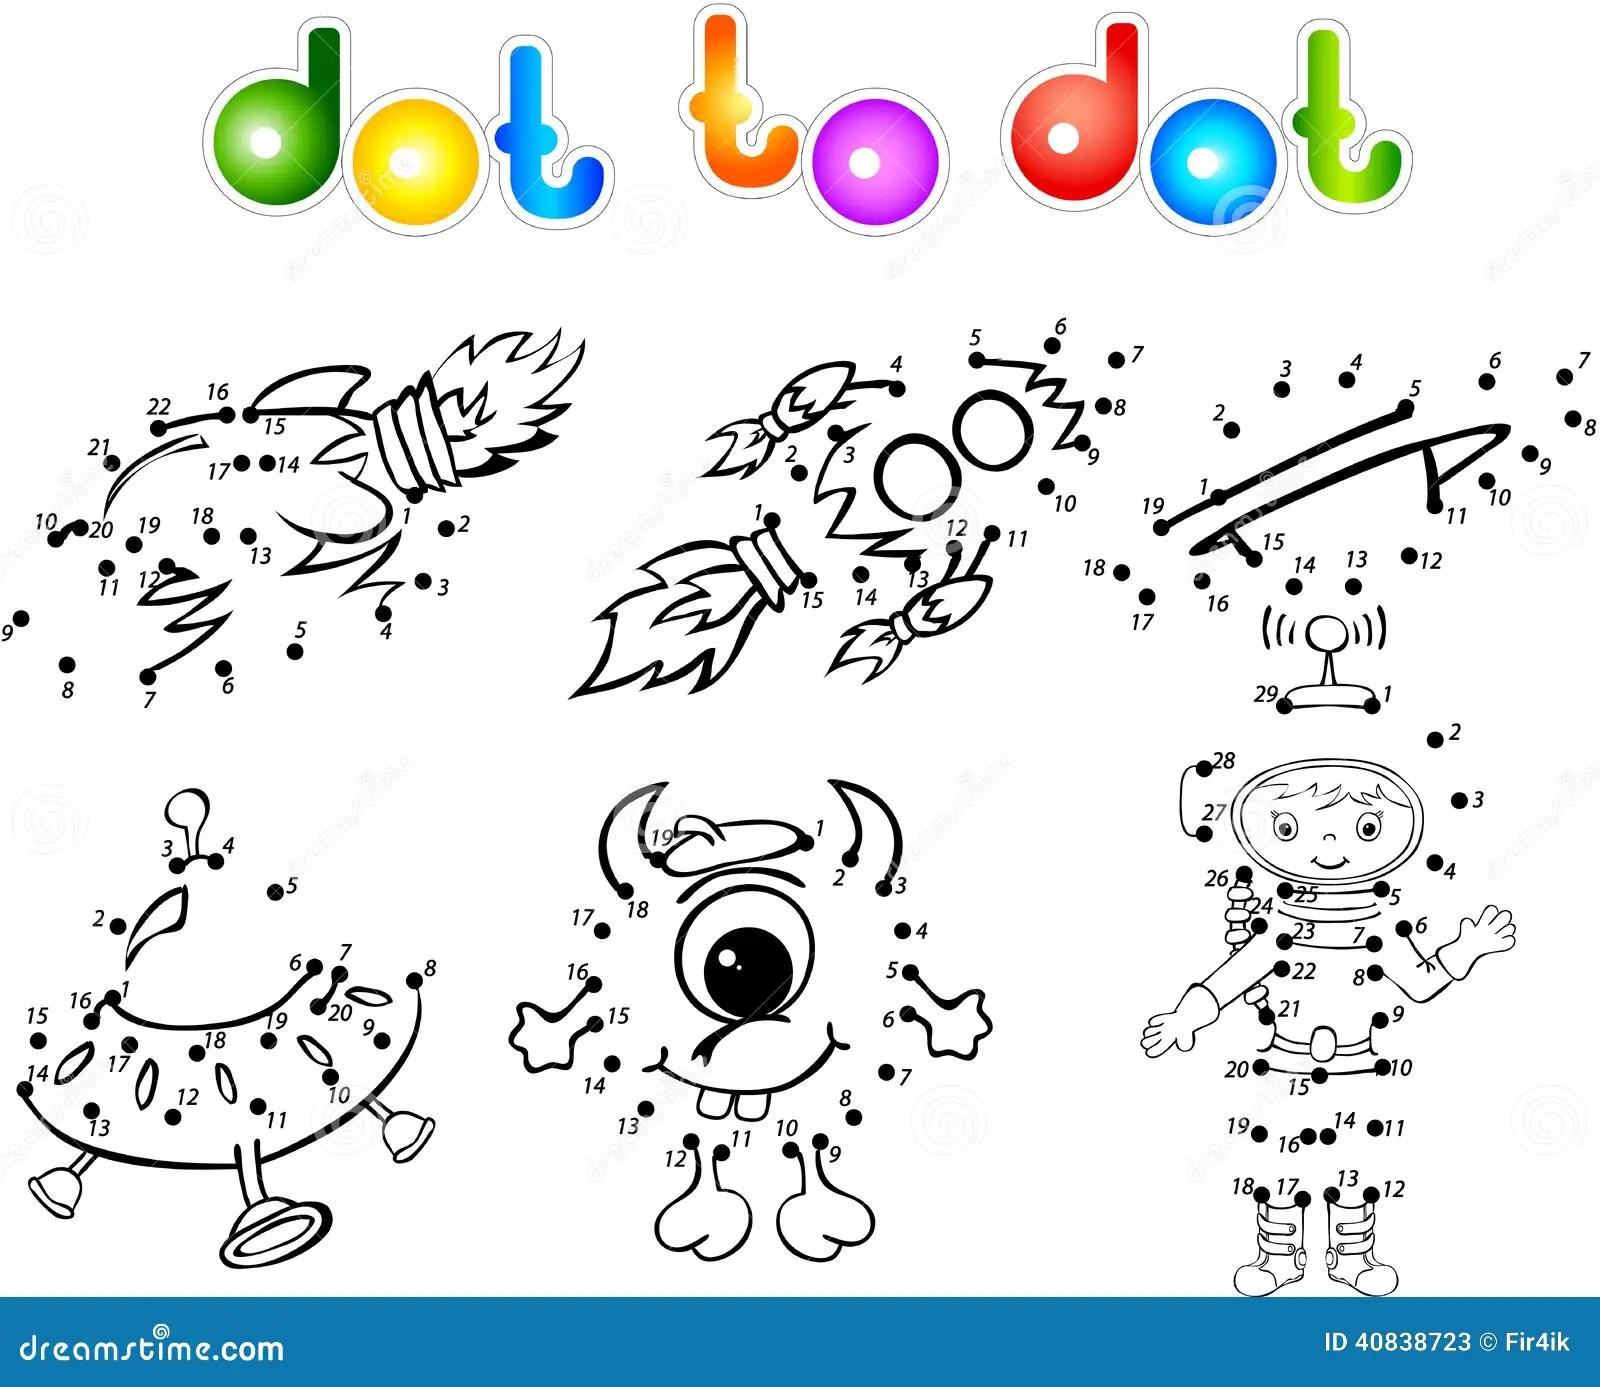 Spase Set 2 Dot To Dot Stock Vector